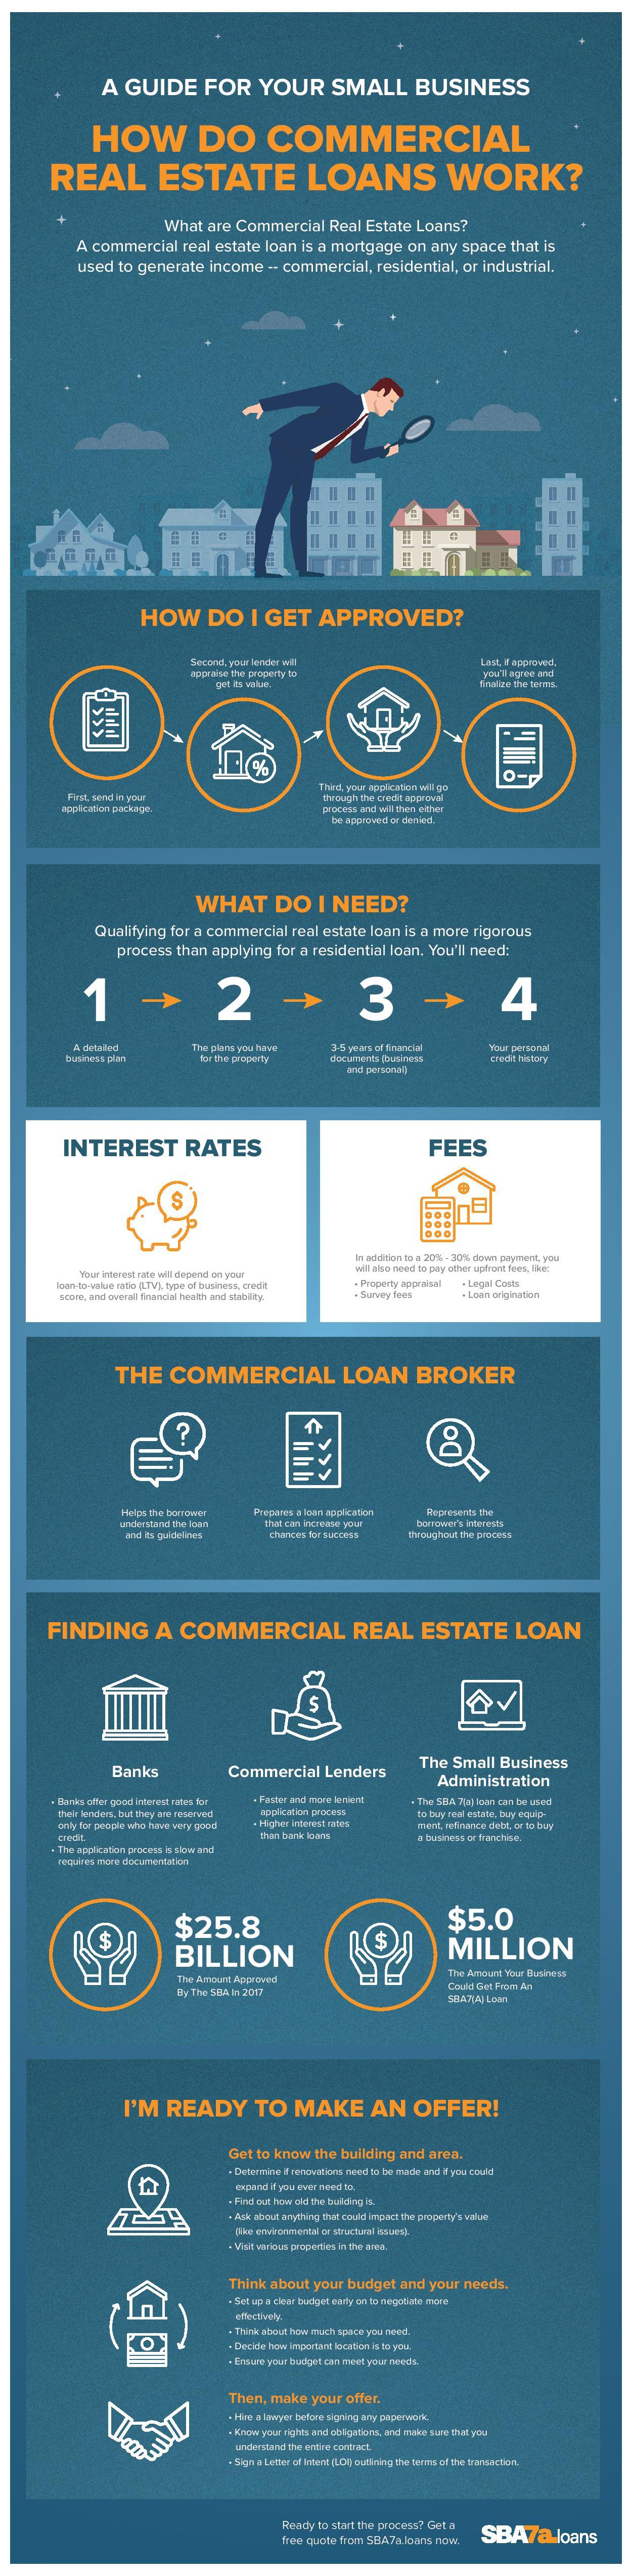 infographic-sba-loans-102618-page-001.jpg